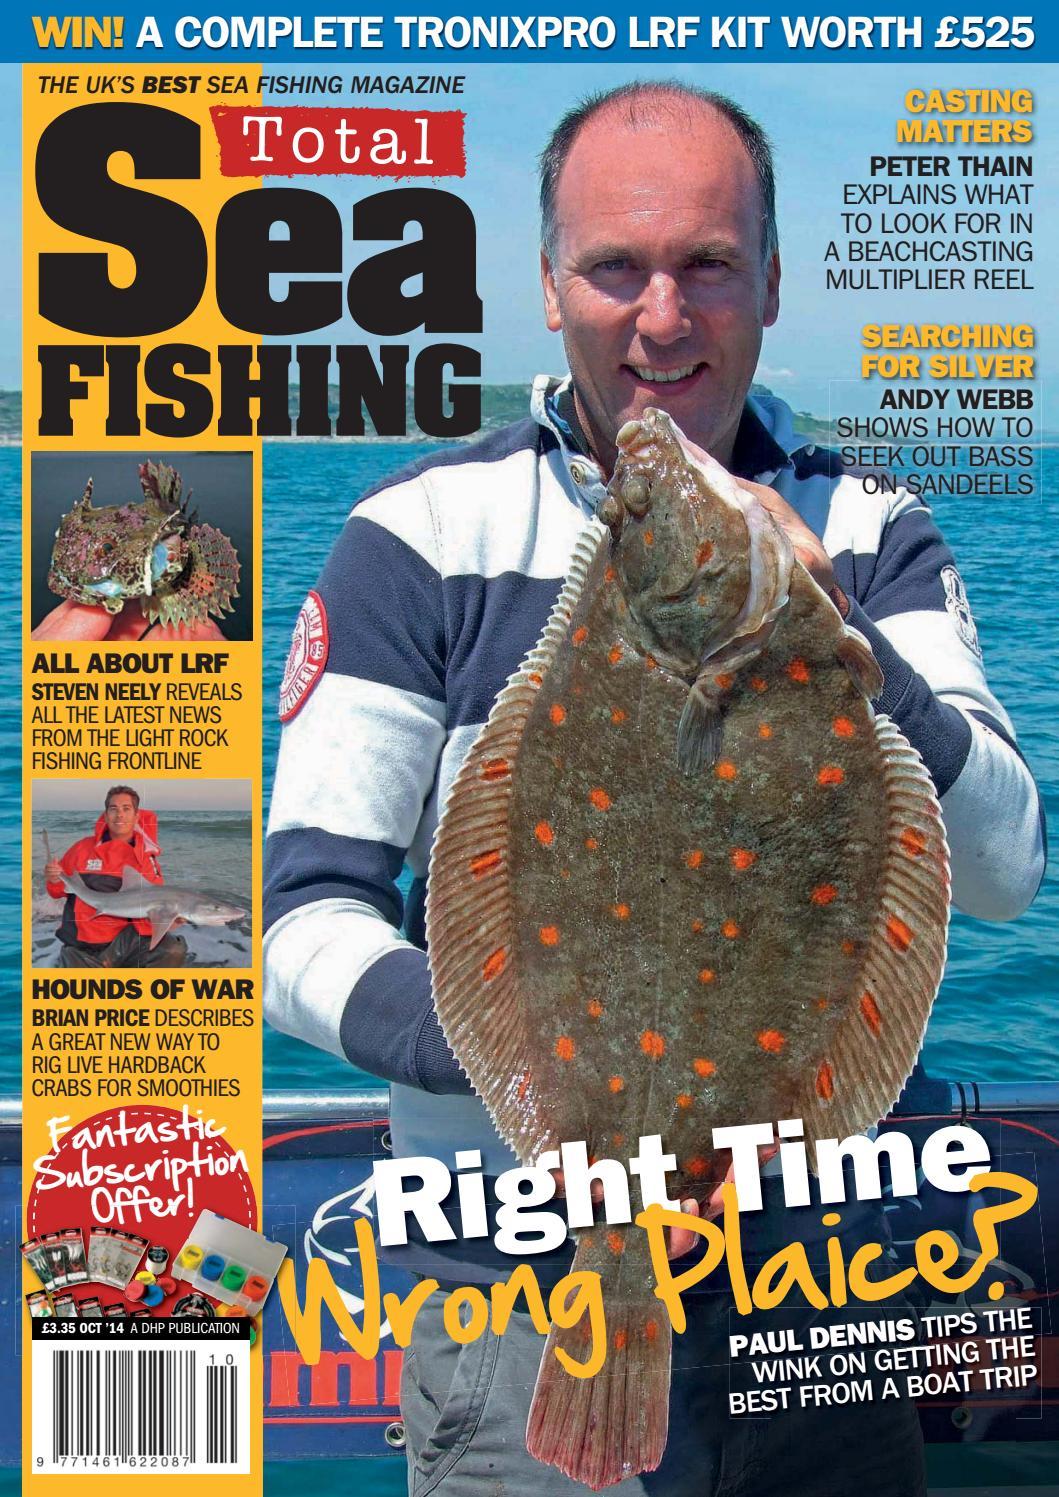 Total sea fishing october 2014 uk by Eugen Robu - issuu